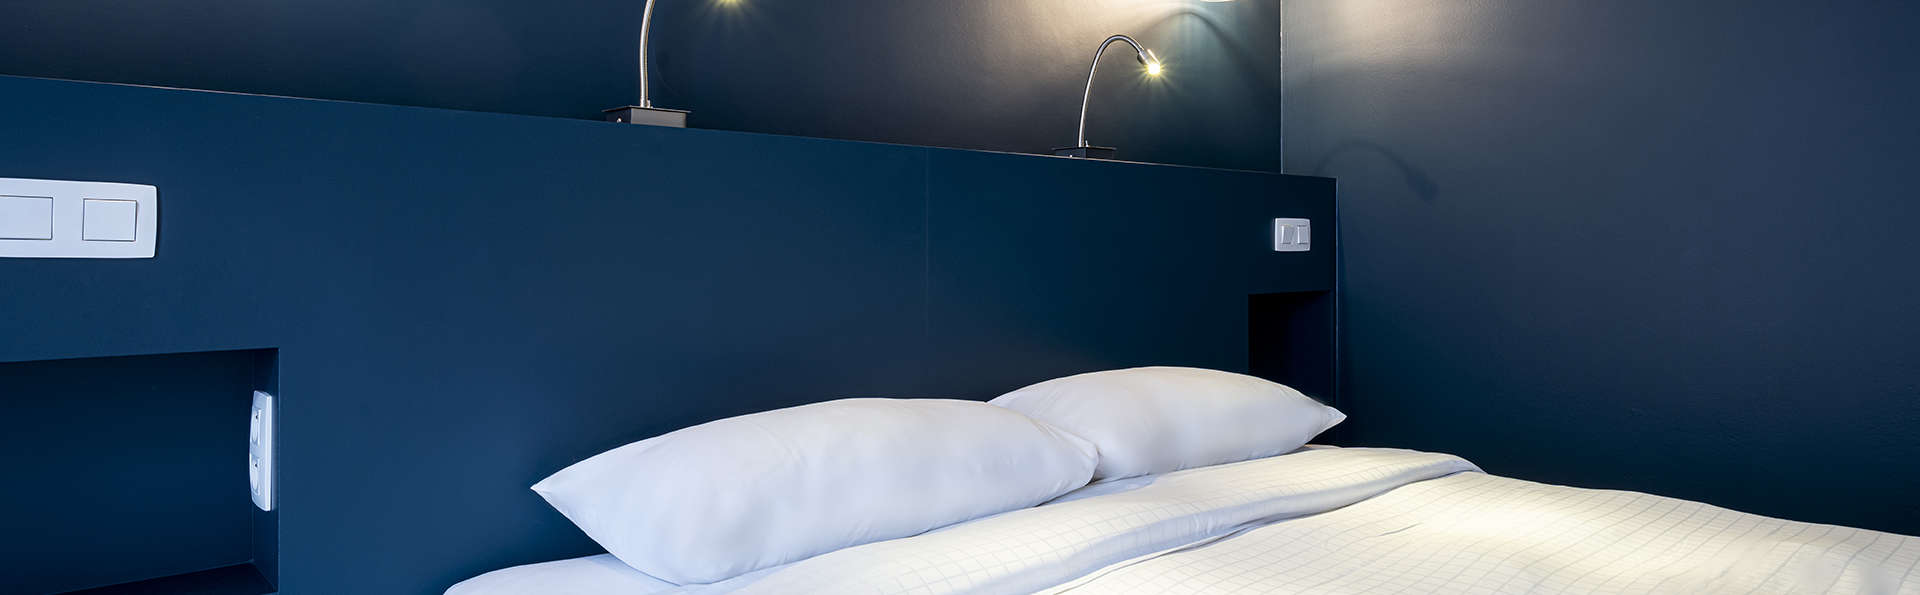 Beverly Hills Hotel - EDIT_Chambre_standard_2.jpg